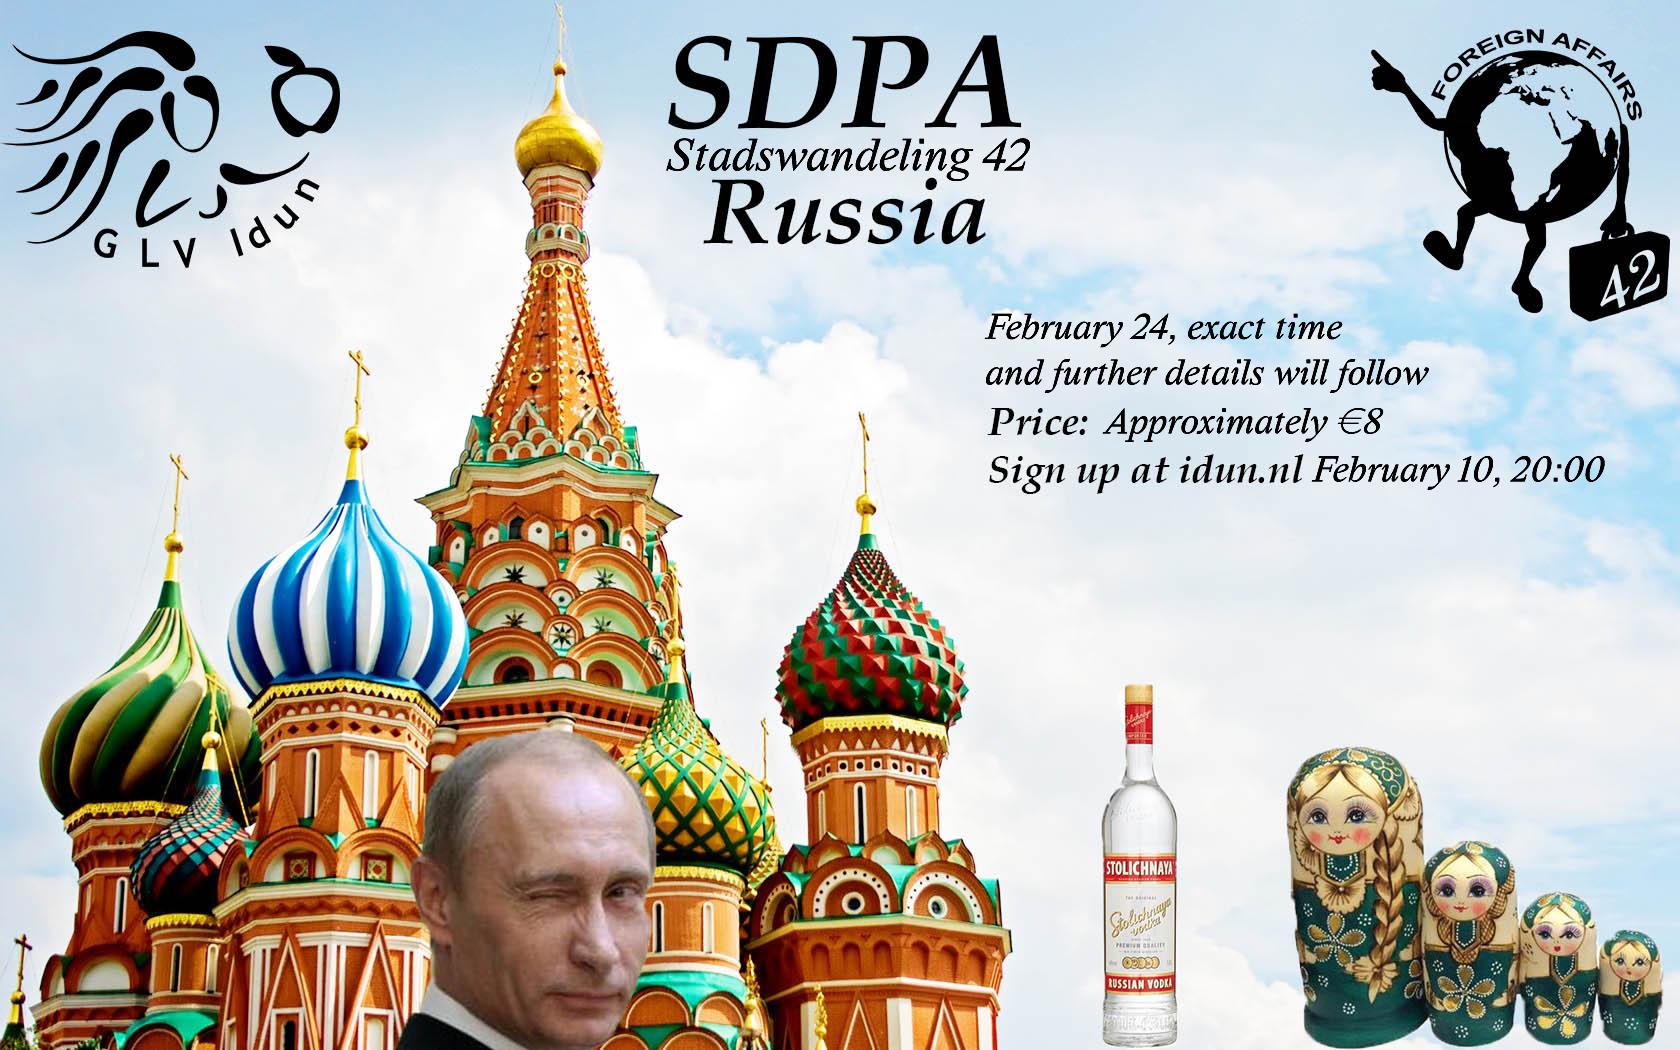 SDPA (Stadswandeling 42)